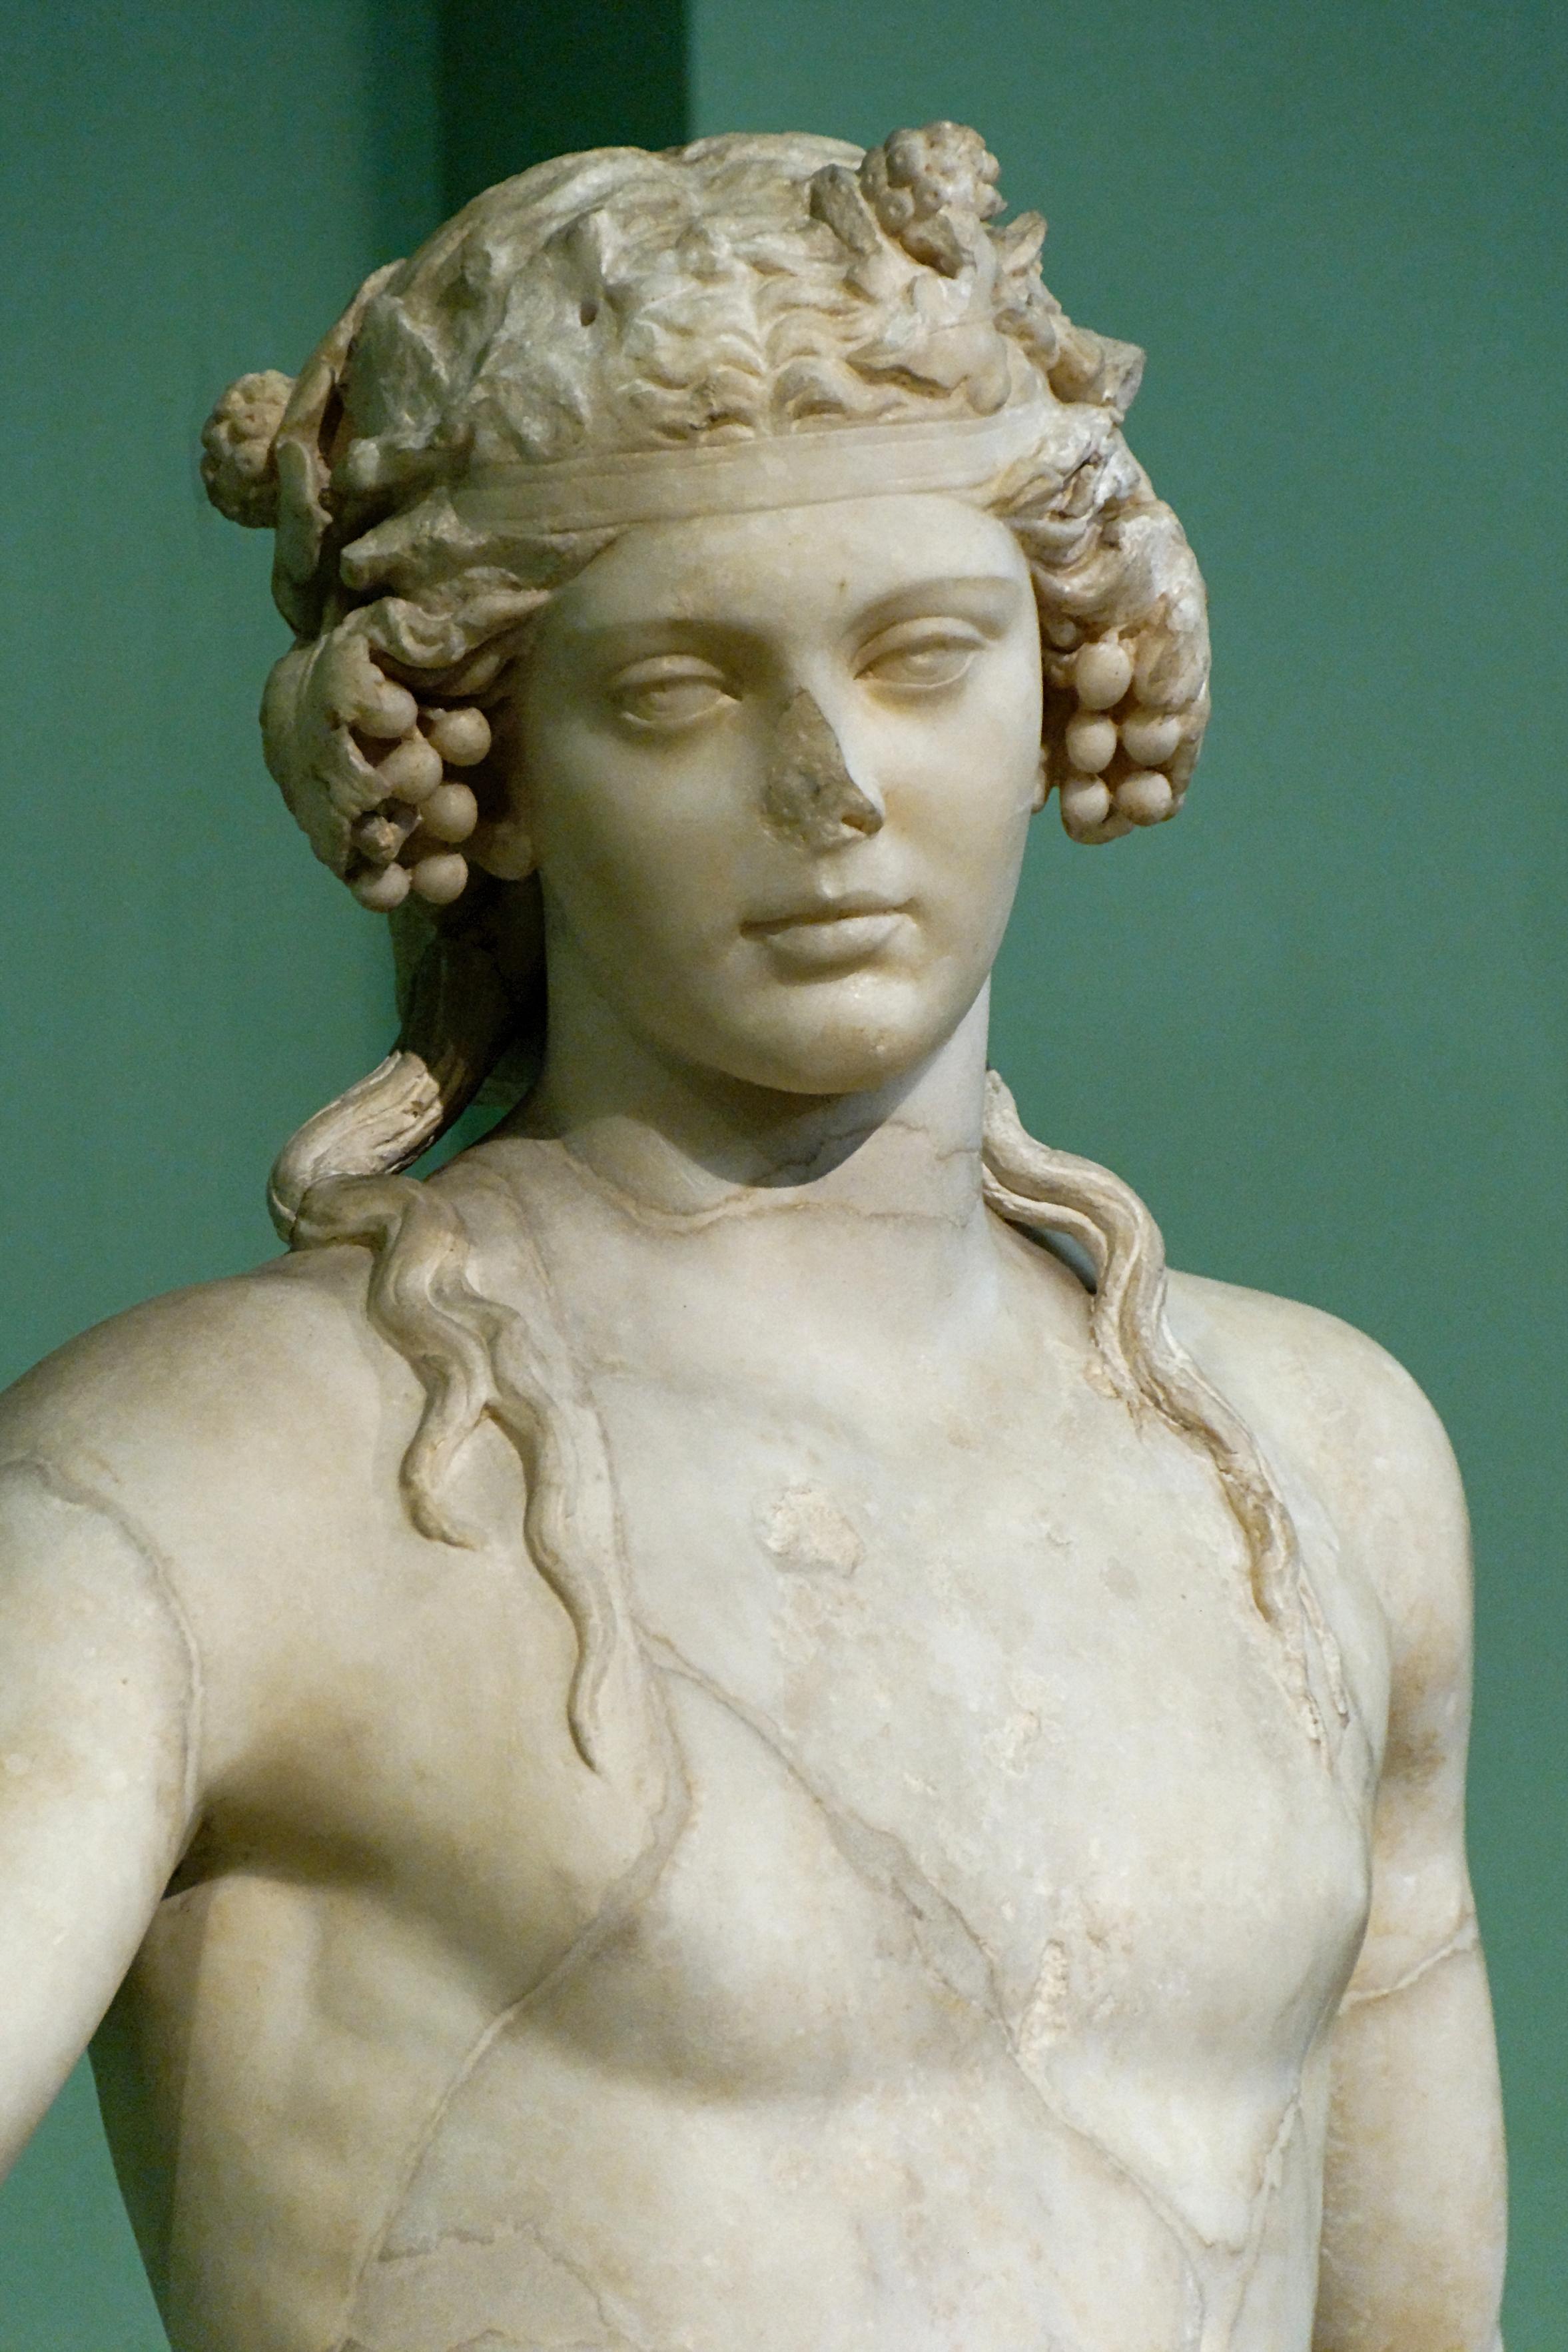 Greek Drama-rama | dr dud's dicta